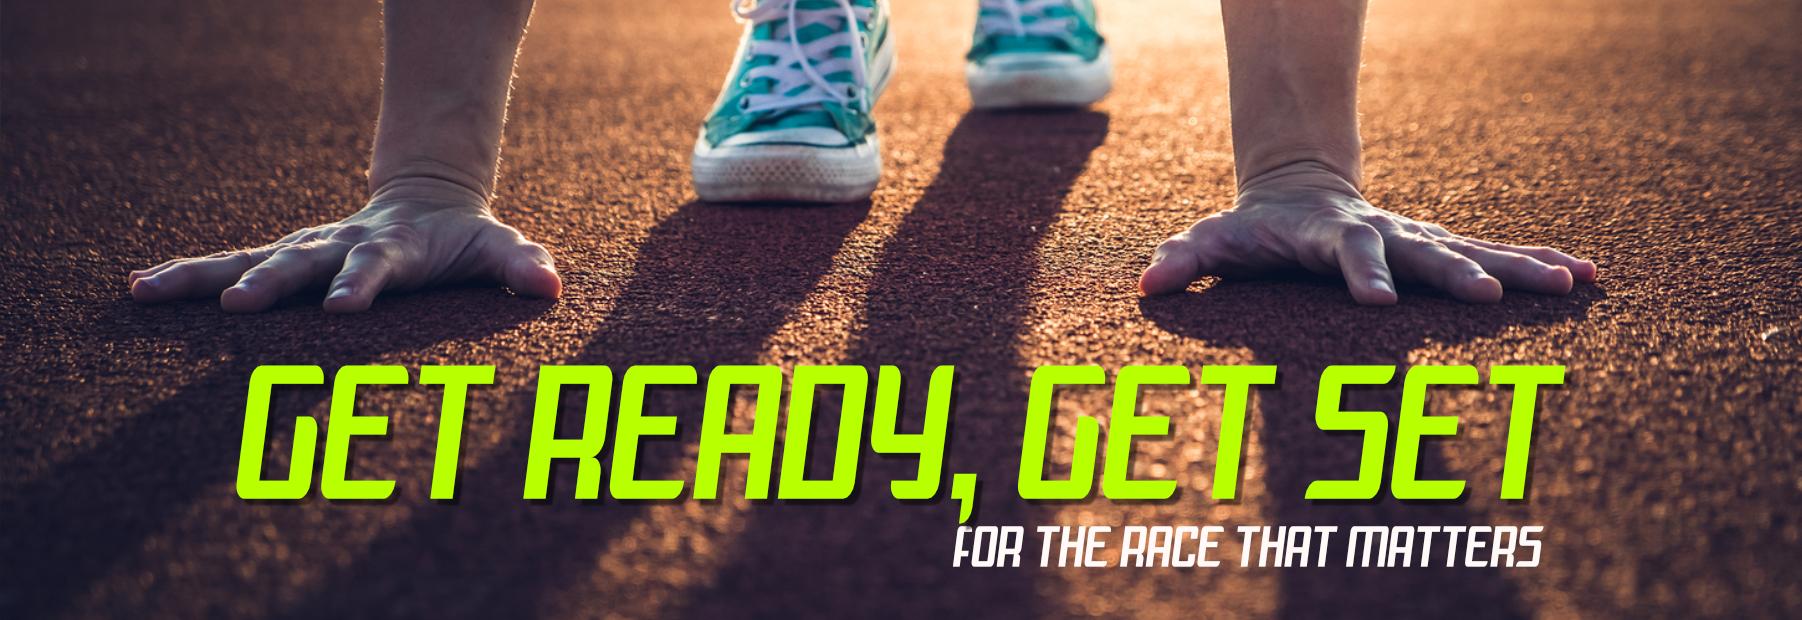 Get Ready webbanner.jpg